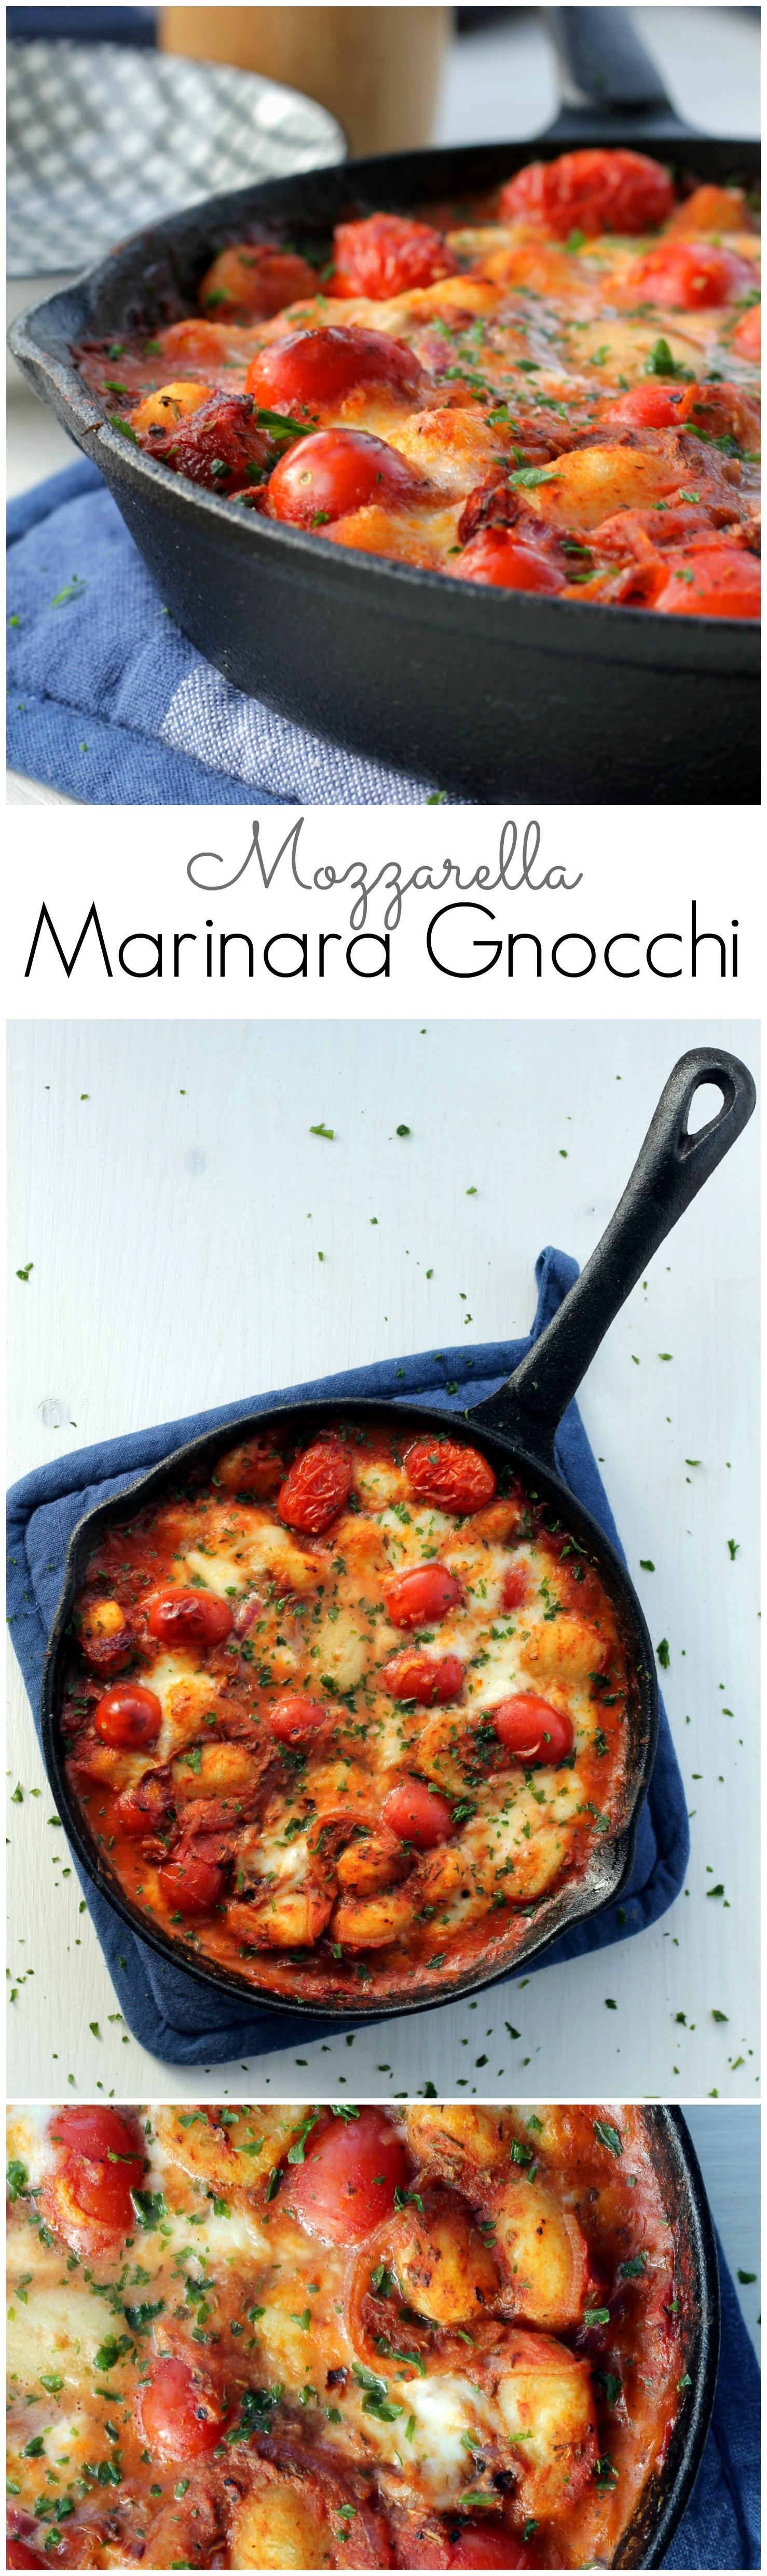 Mozzarella & Gnocchi Marinara